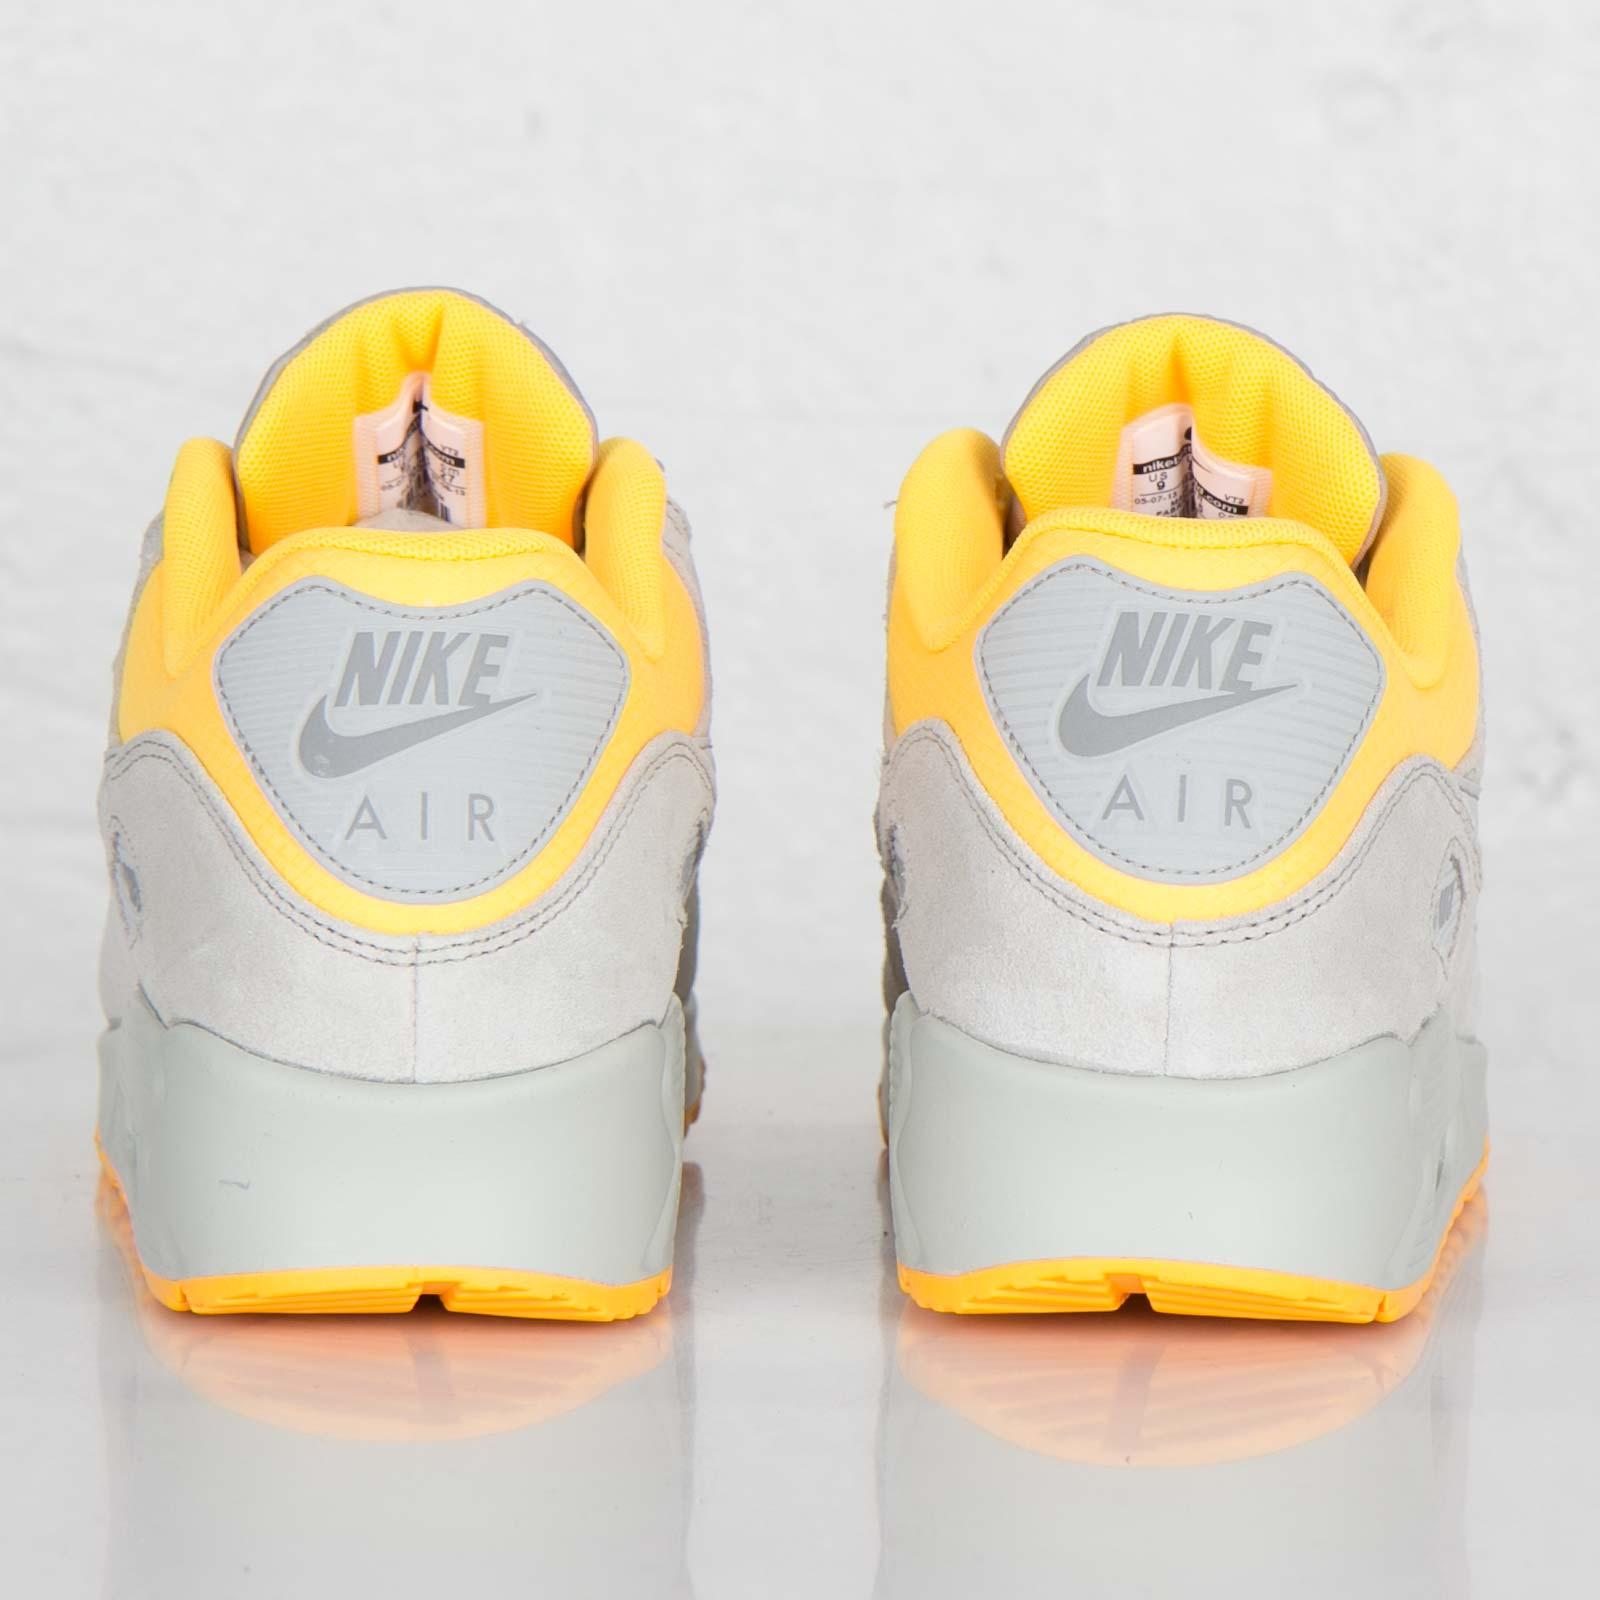 watch 9b9e8 a02aa Nike Air Max 90 Premium - 333888-028 - Sneakersnstuff   sneakers    streetwear online since 1999